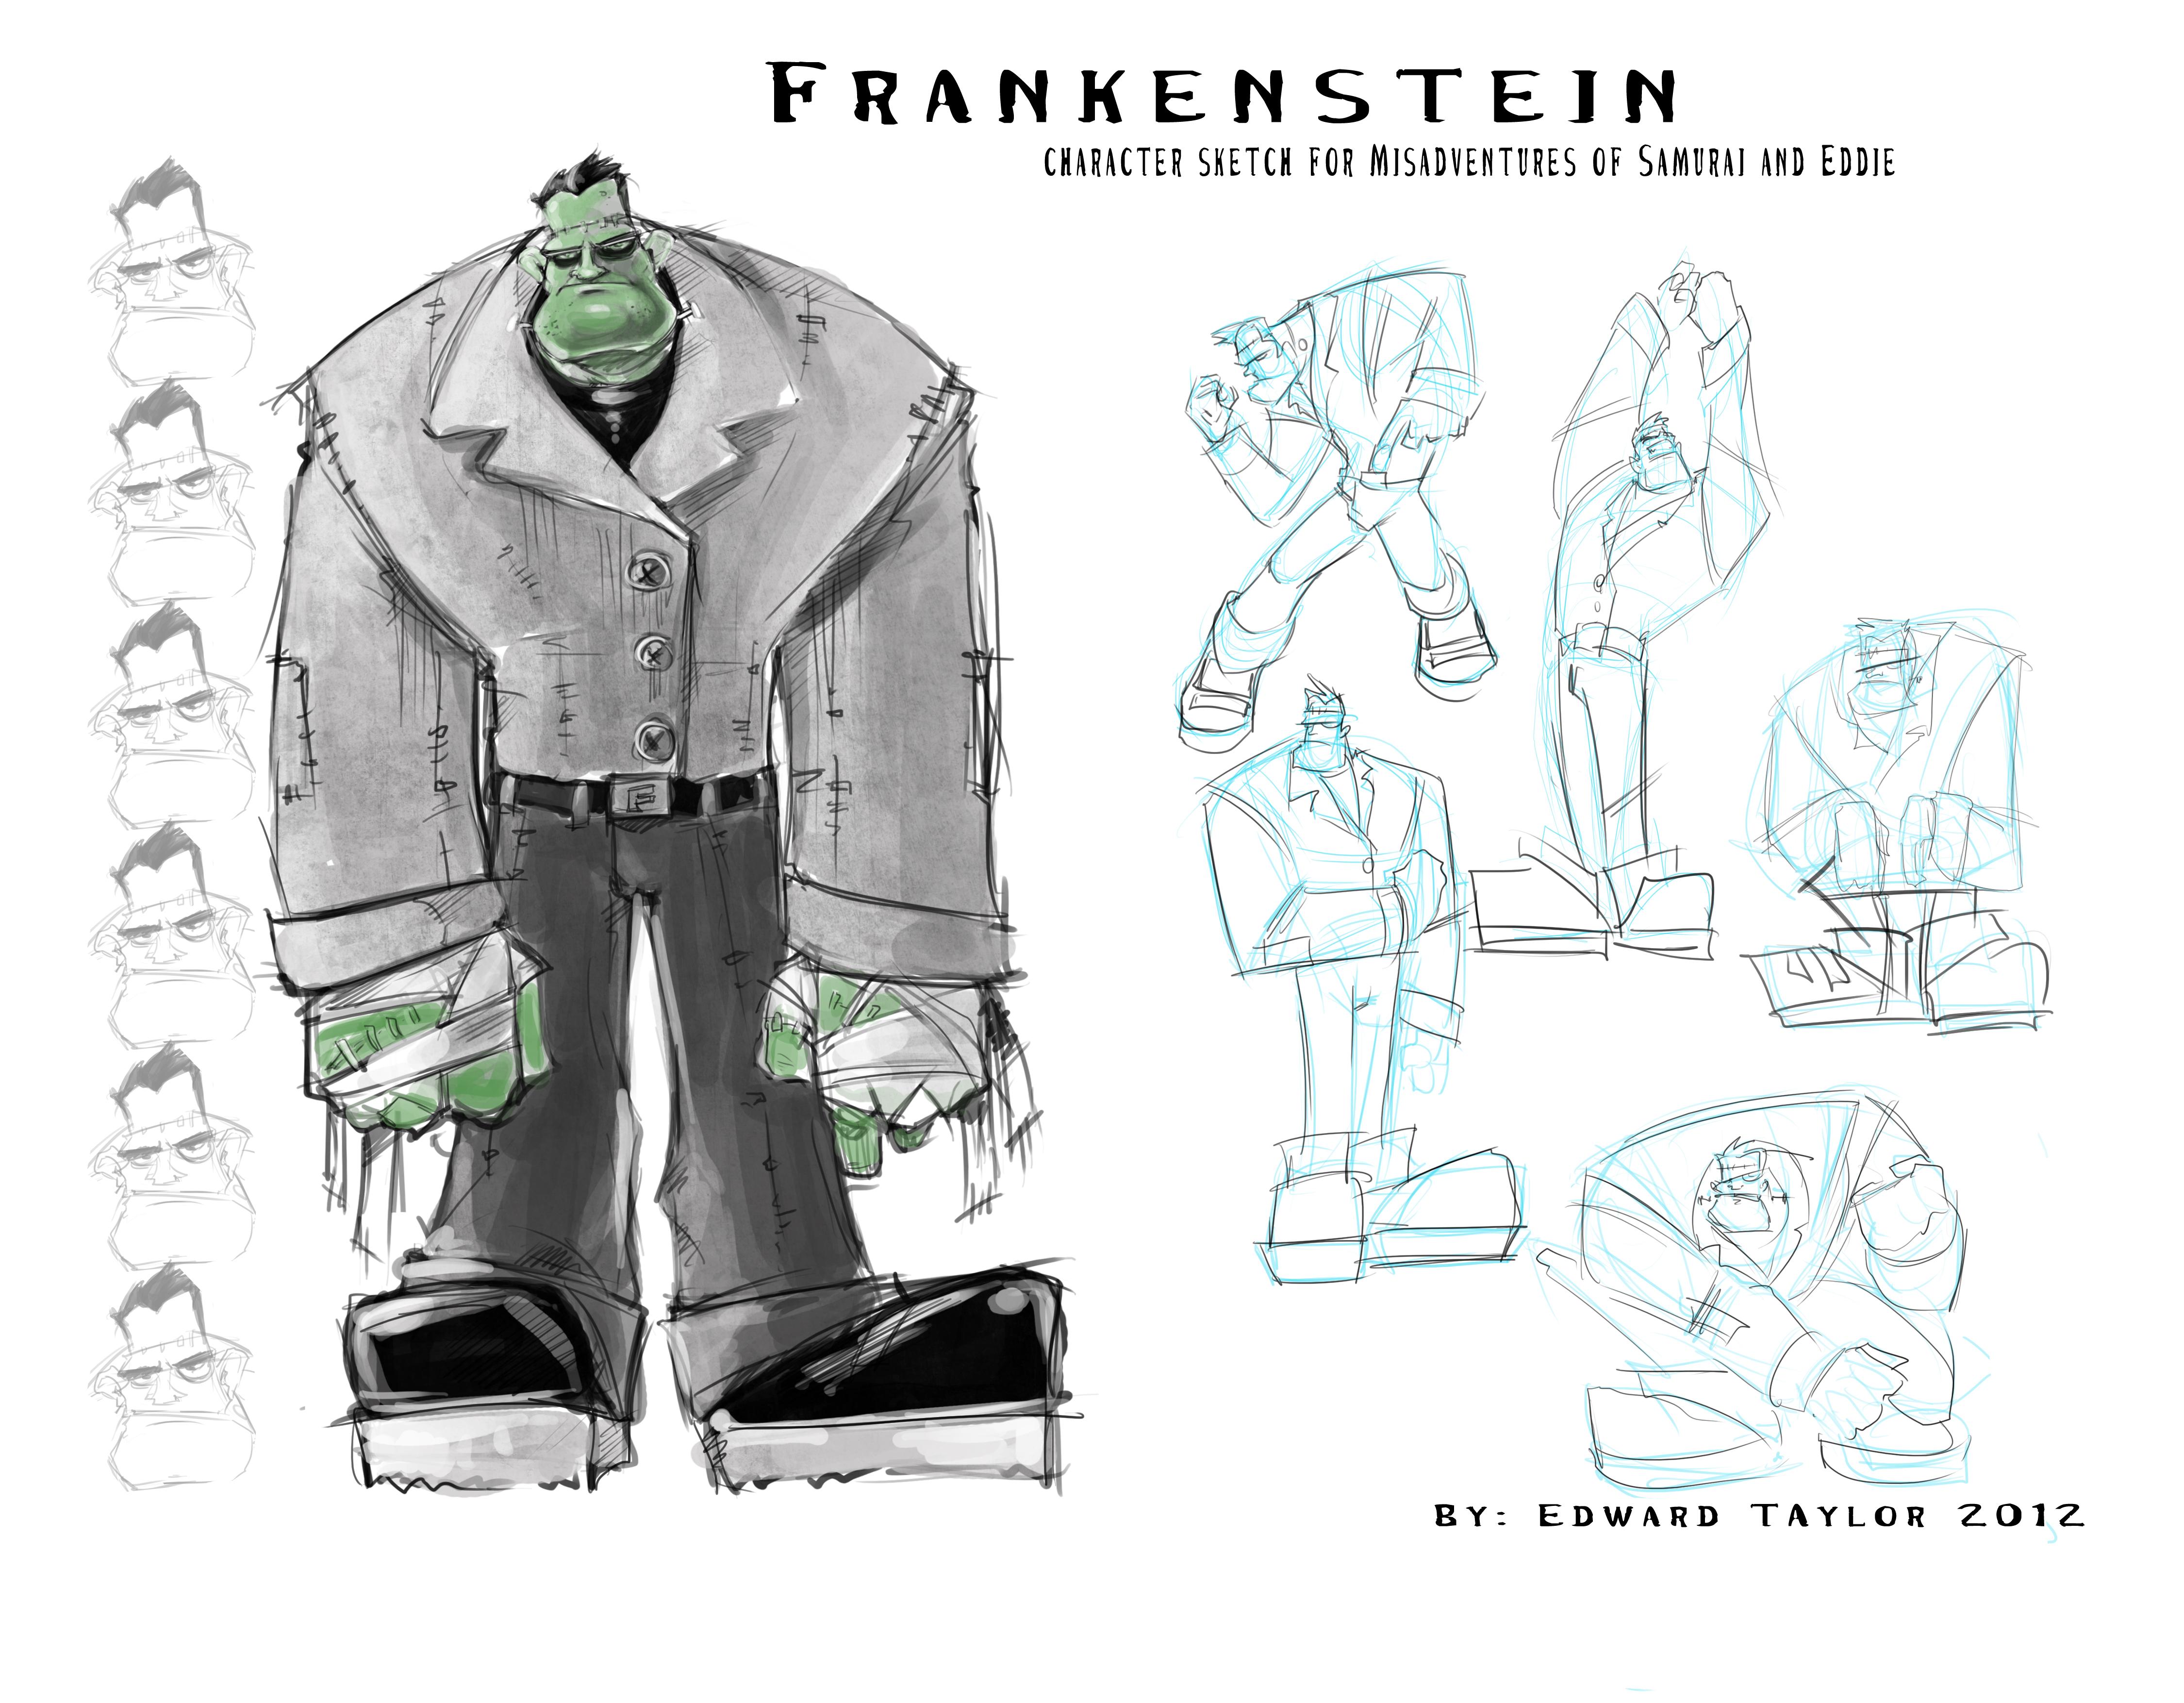 misadventure character sketch  frankenstein  u2013 edwardian taylor